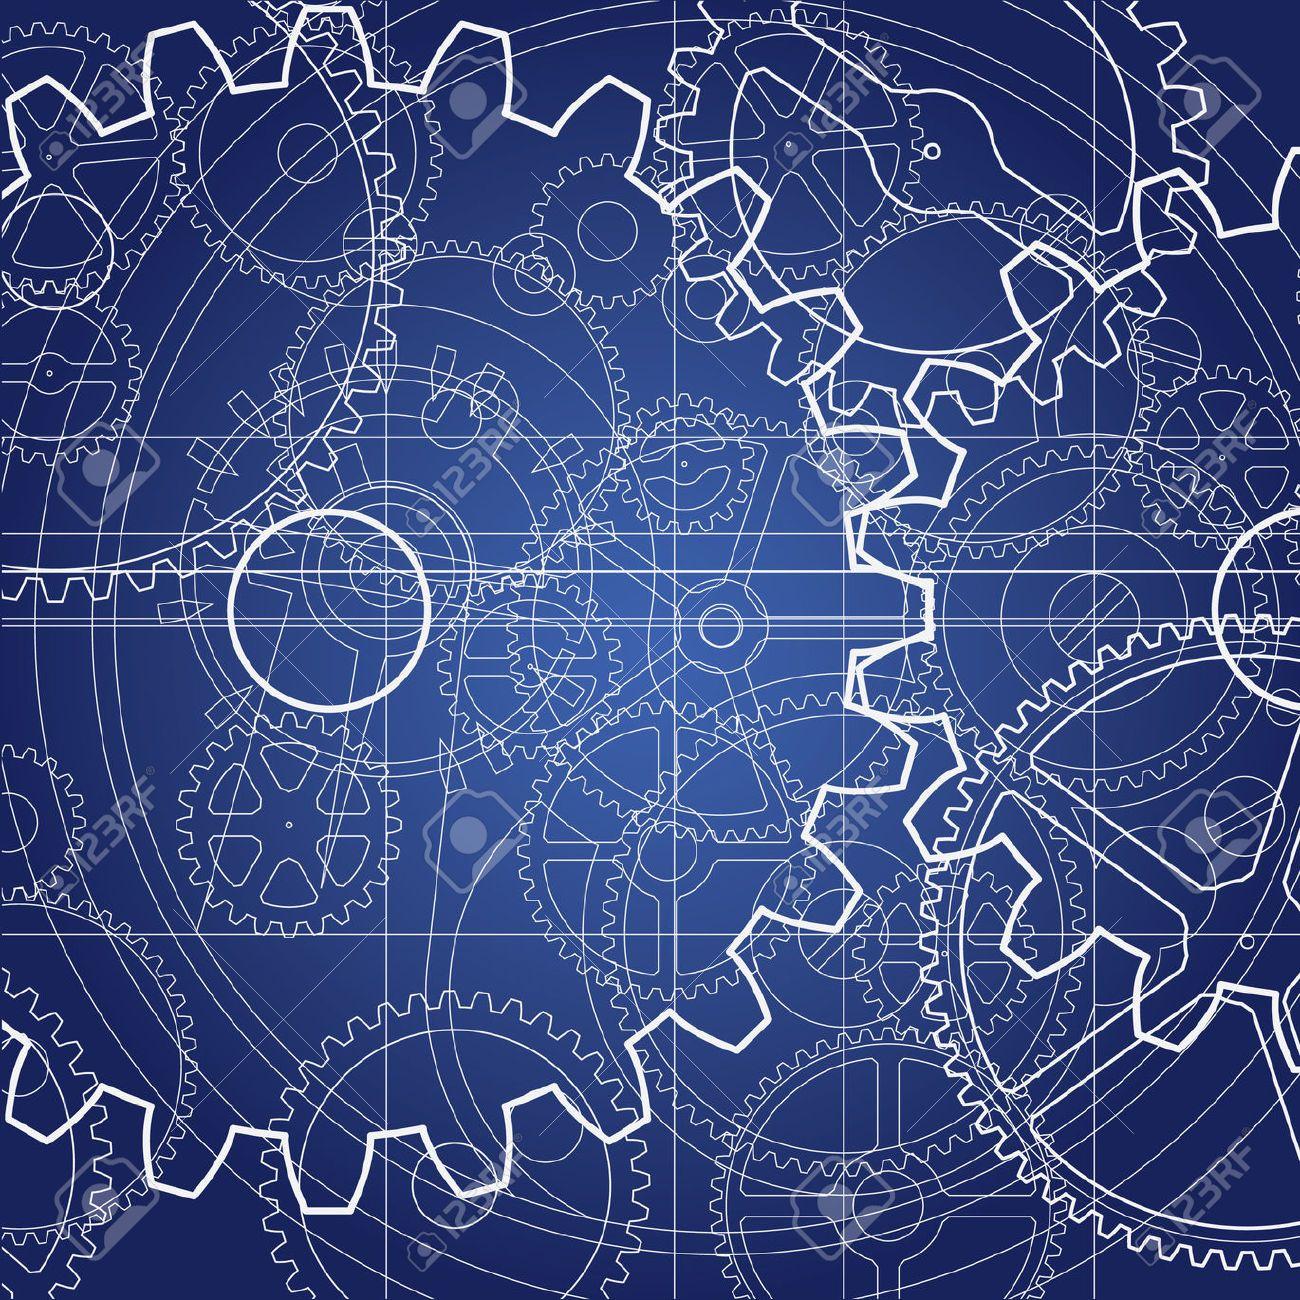 8797461 gears blueprint stock vector engineering mechanical 8797461 gears blueprint stock vector engineering mechanical blueprint malvernweather Choice Image